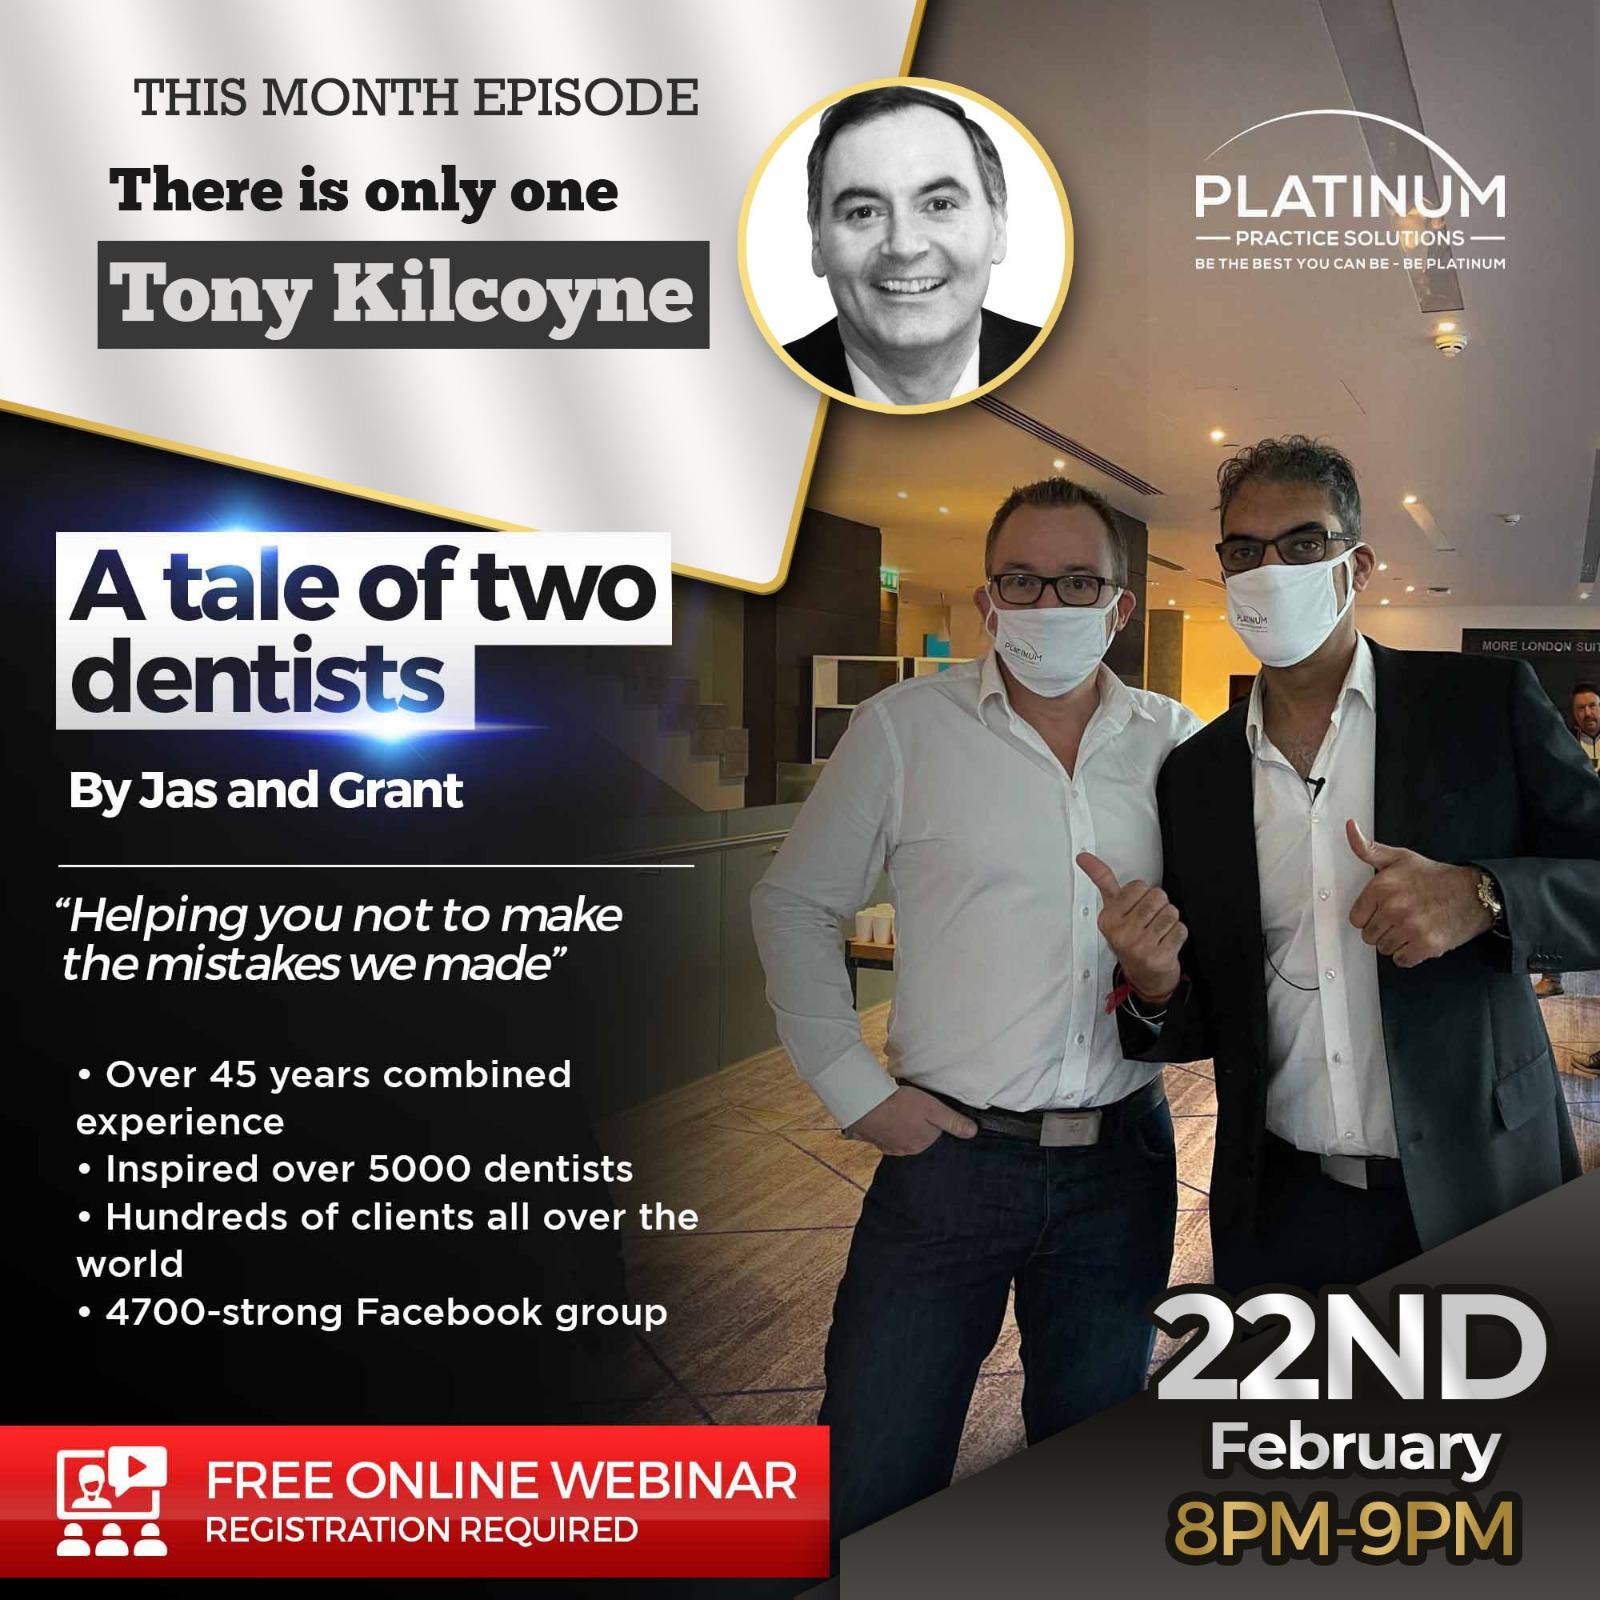 Platinum Practice Solutions Webinar with Tony Kilcoyne